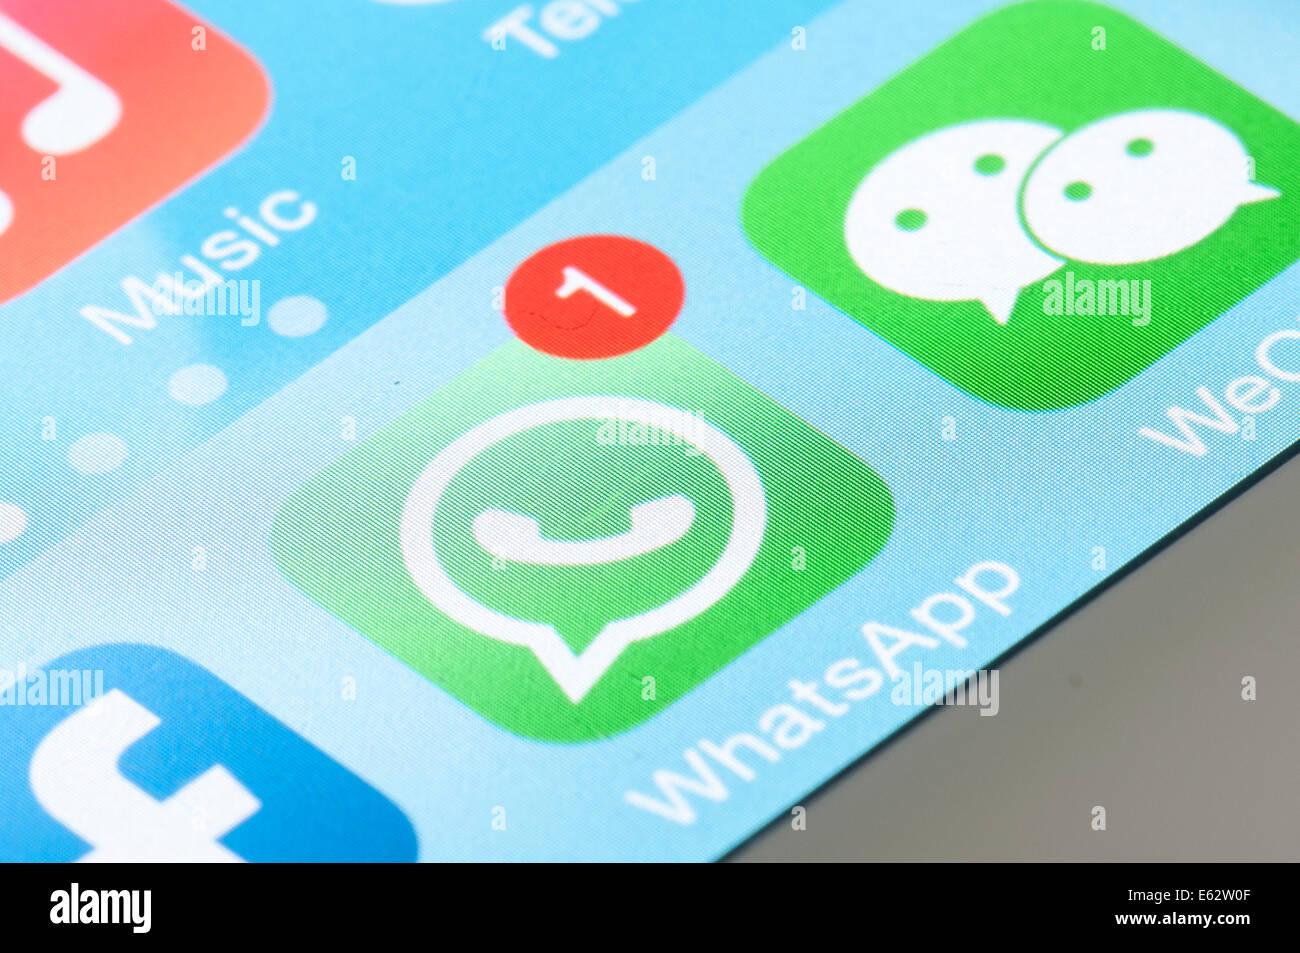 WhatsApp whats app logo icon in mobile screen Stock Photo